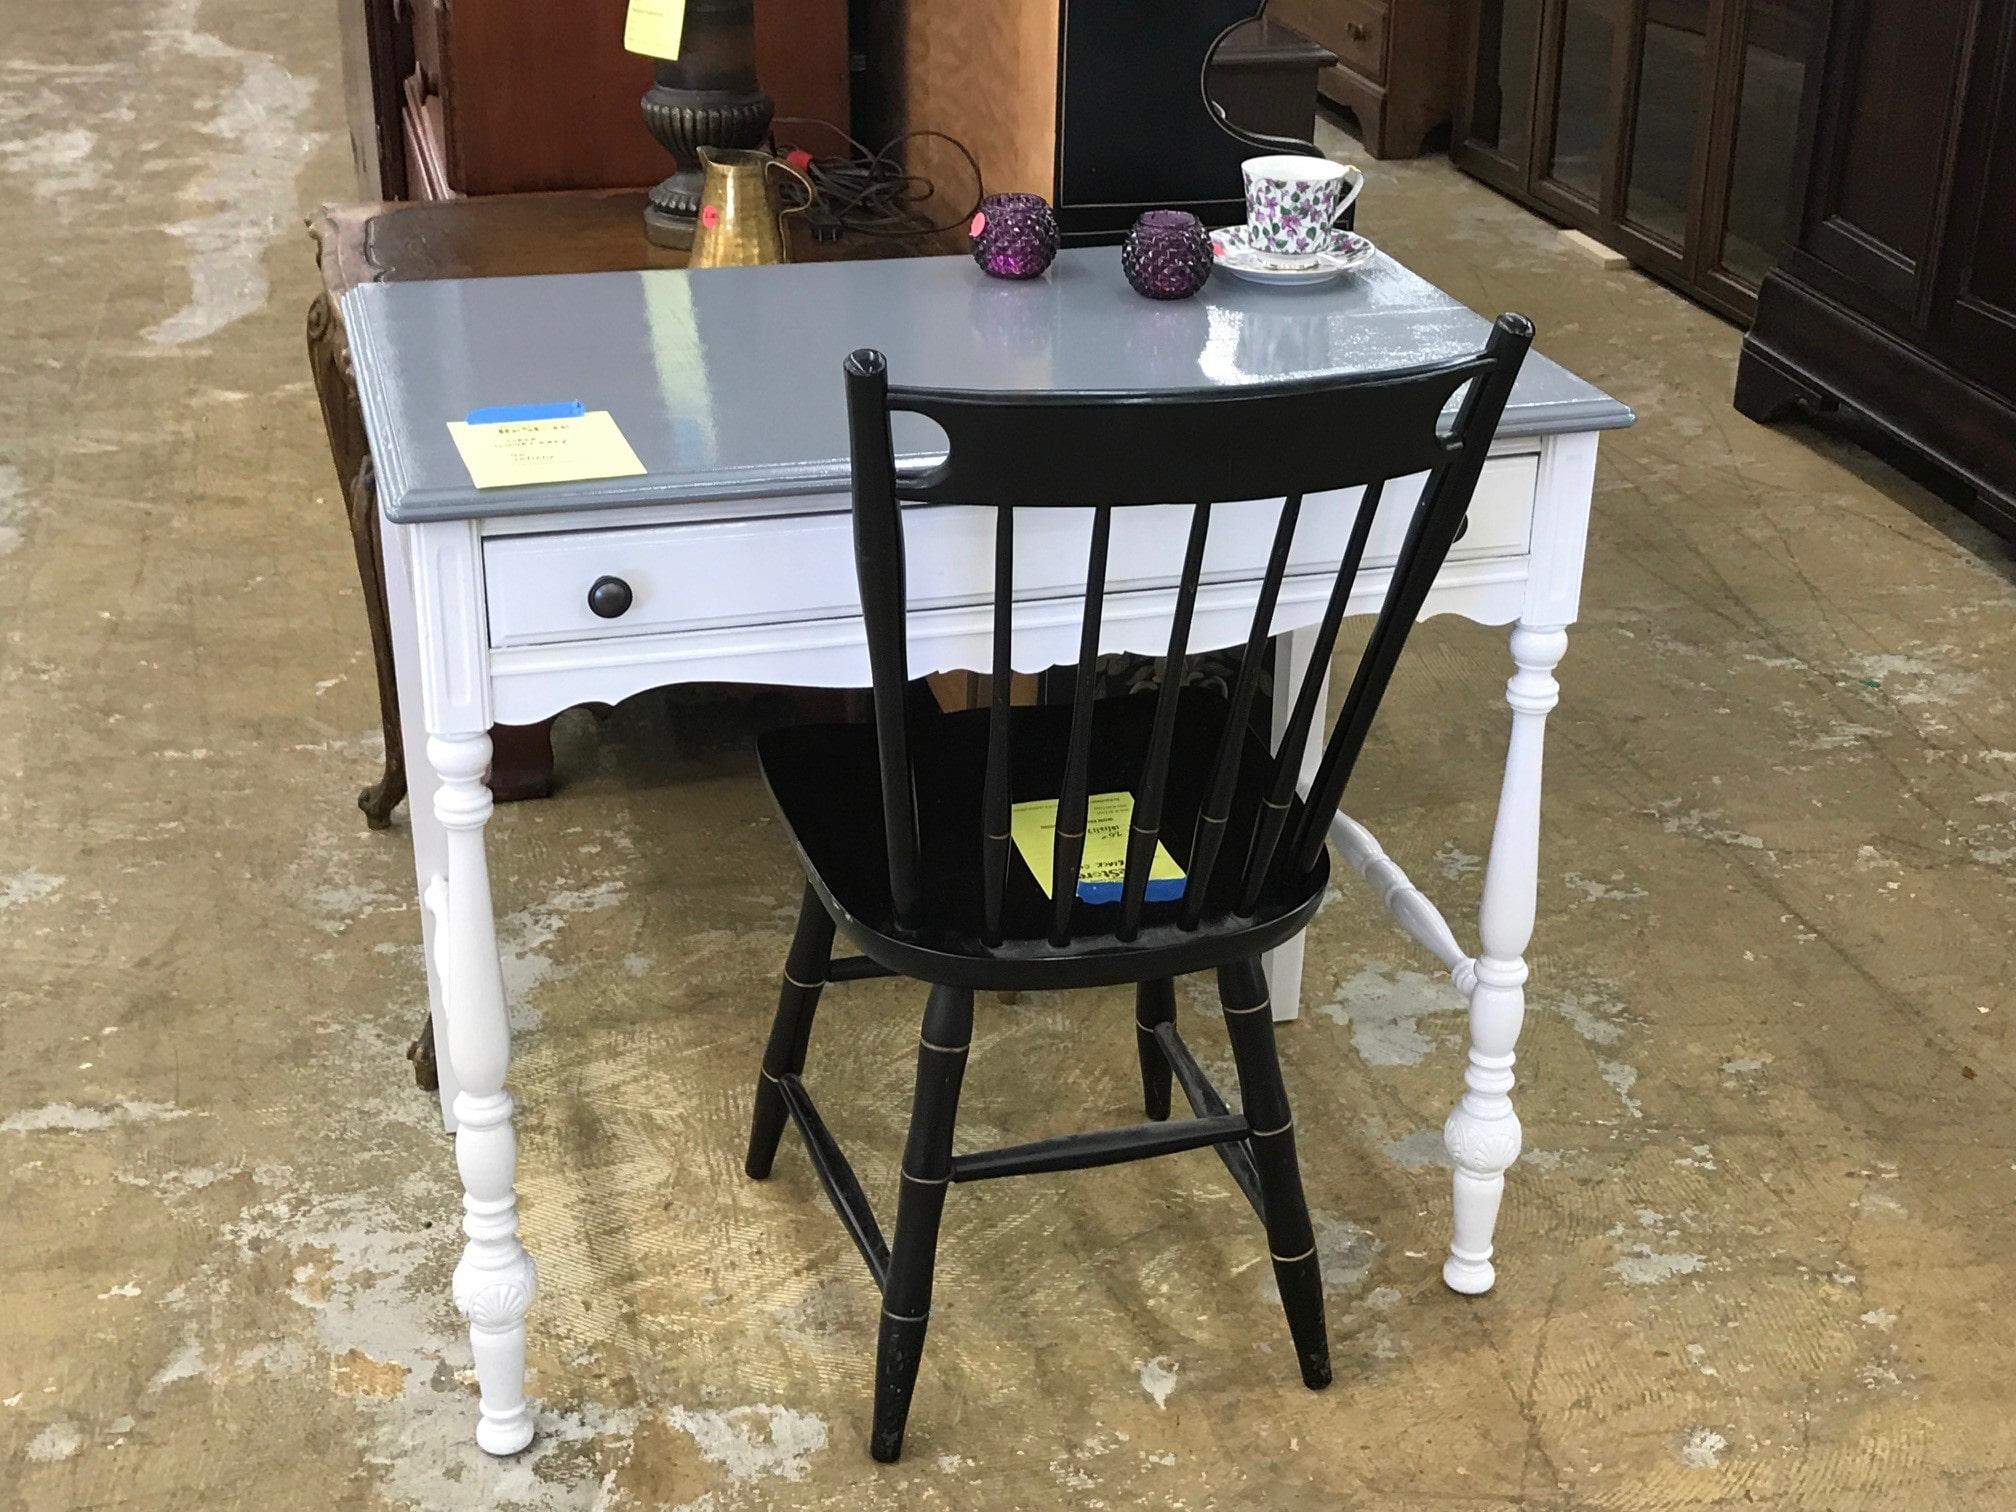 Habitat ReStore Bergen NJ - Furniture for Sale in NJ (6)-min.jpg